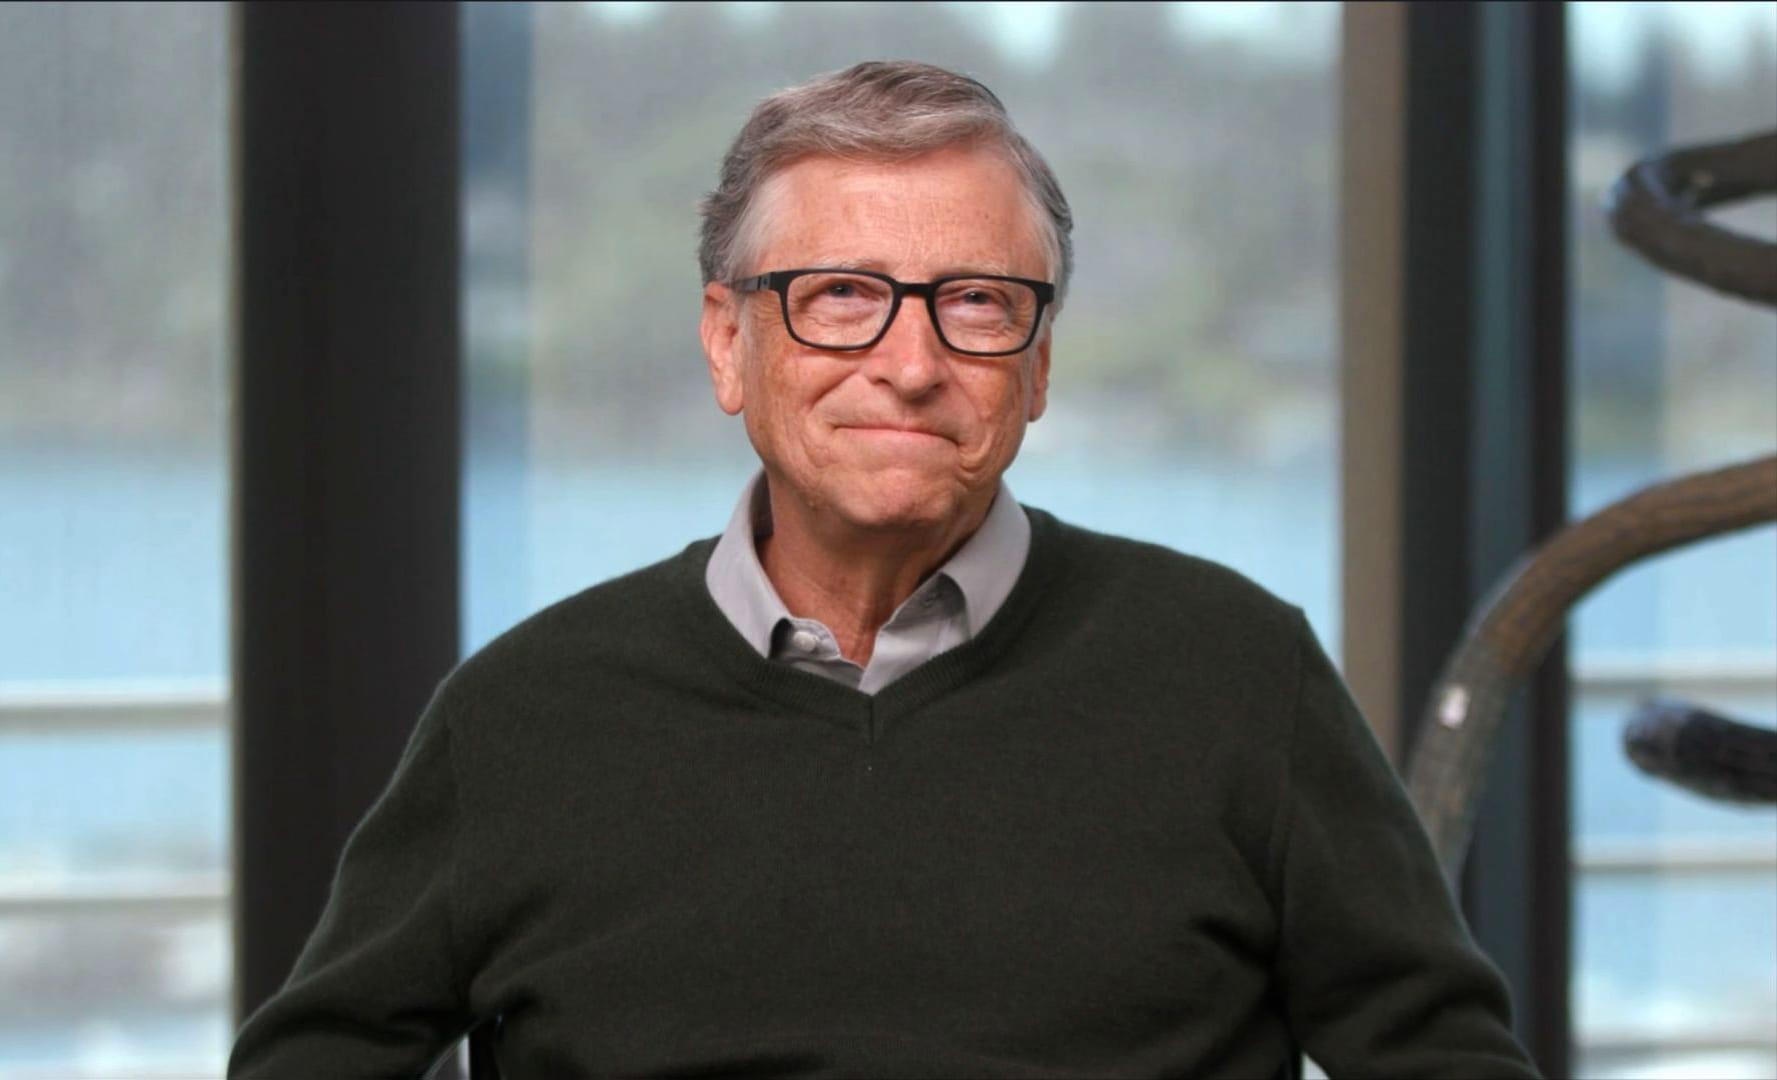 Bill Gates says social media platform Parler's content has some 'crazy stuff'